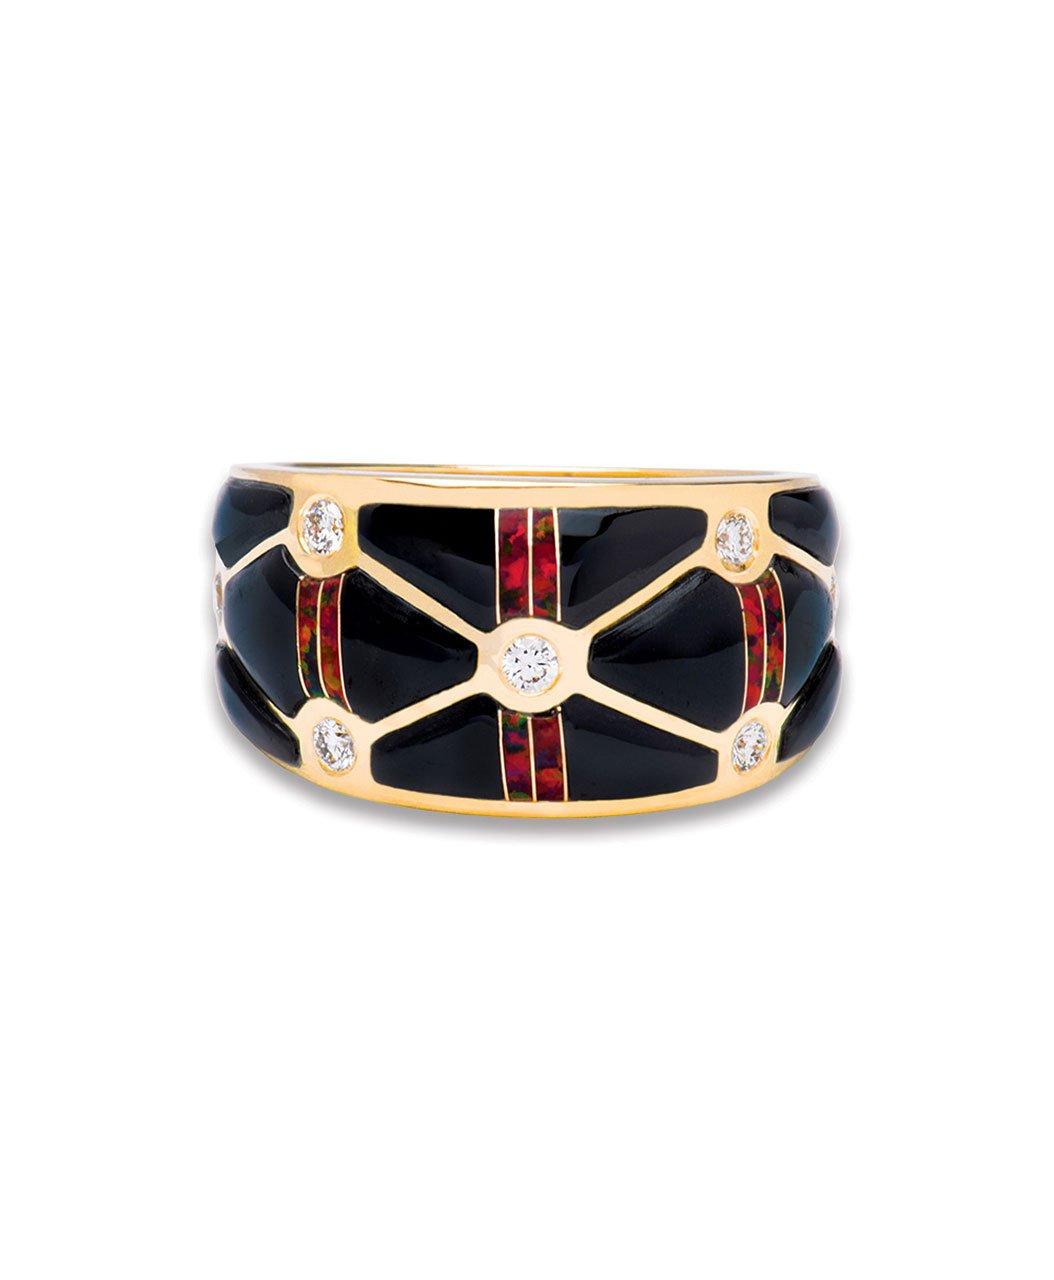 Maverick's 14K Gold Criss-Cross Black Jade Opal Diamond Ring